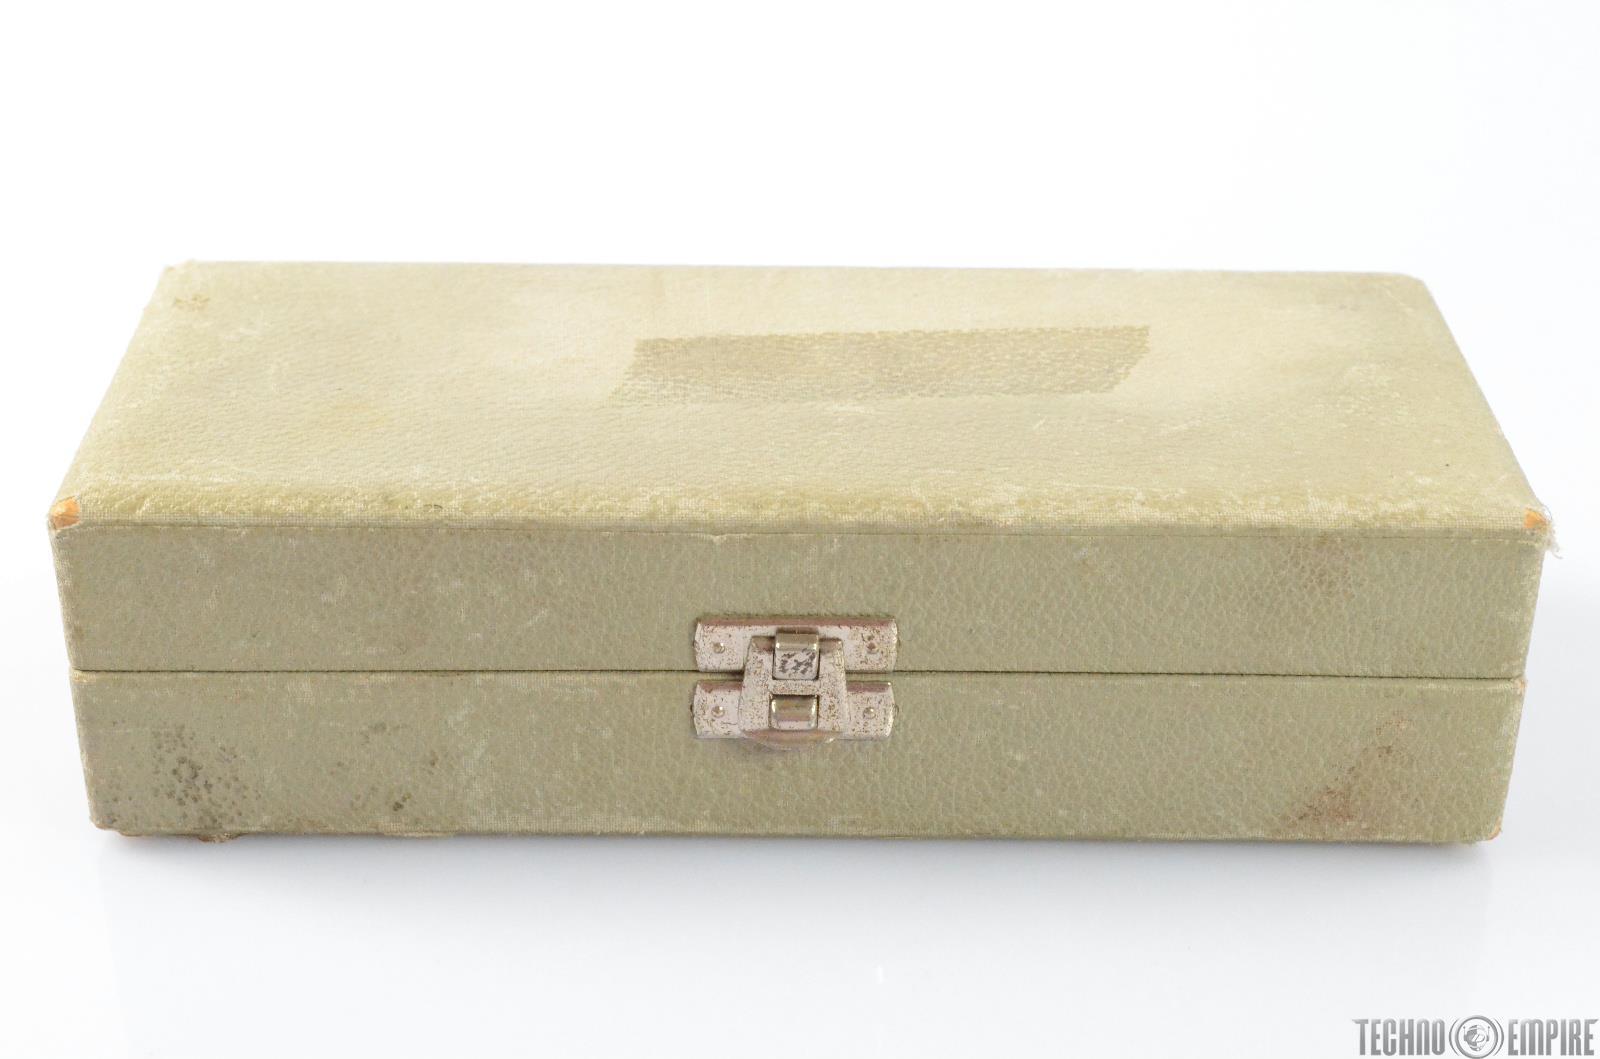 Vintage Neumann AKG Telefunken Microphone Box for Small Condenser Mic #29544